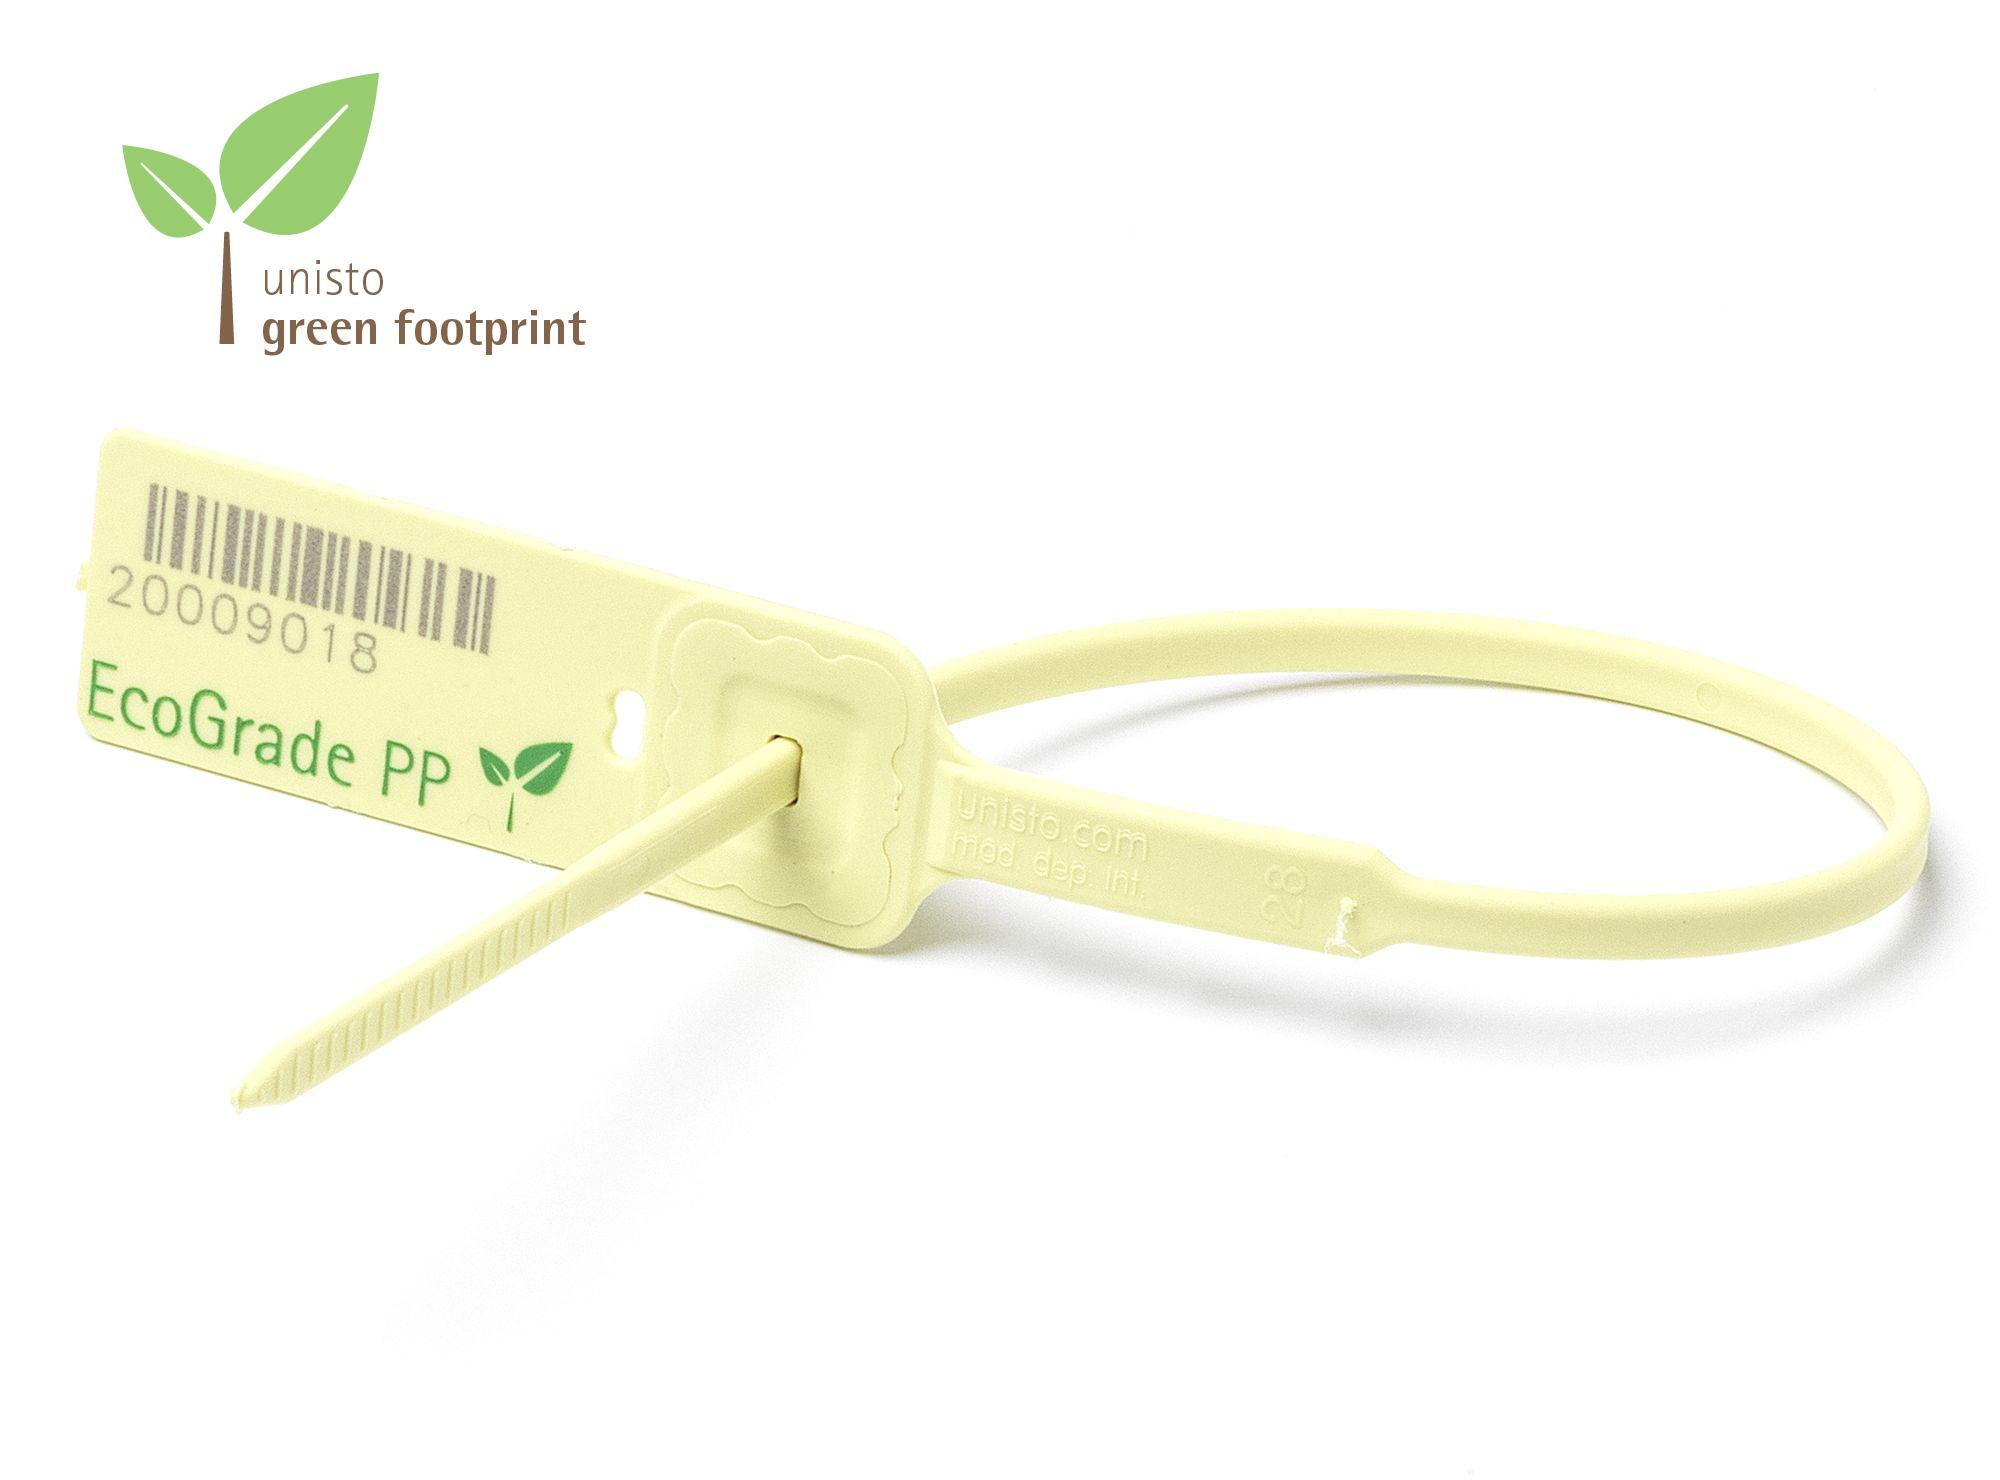 Unisto Varis eco (Ecograde PP)